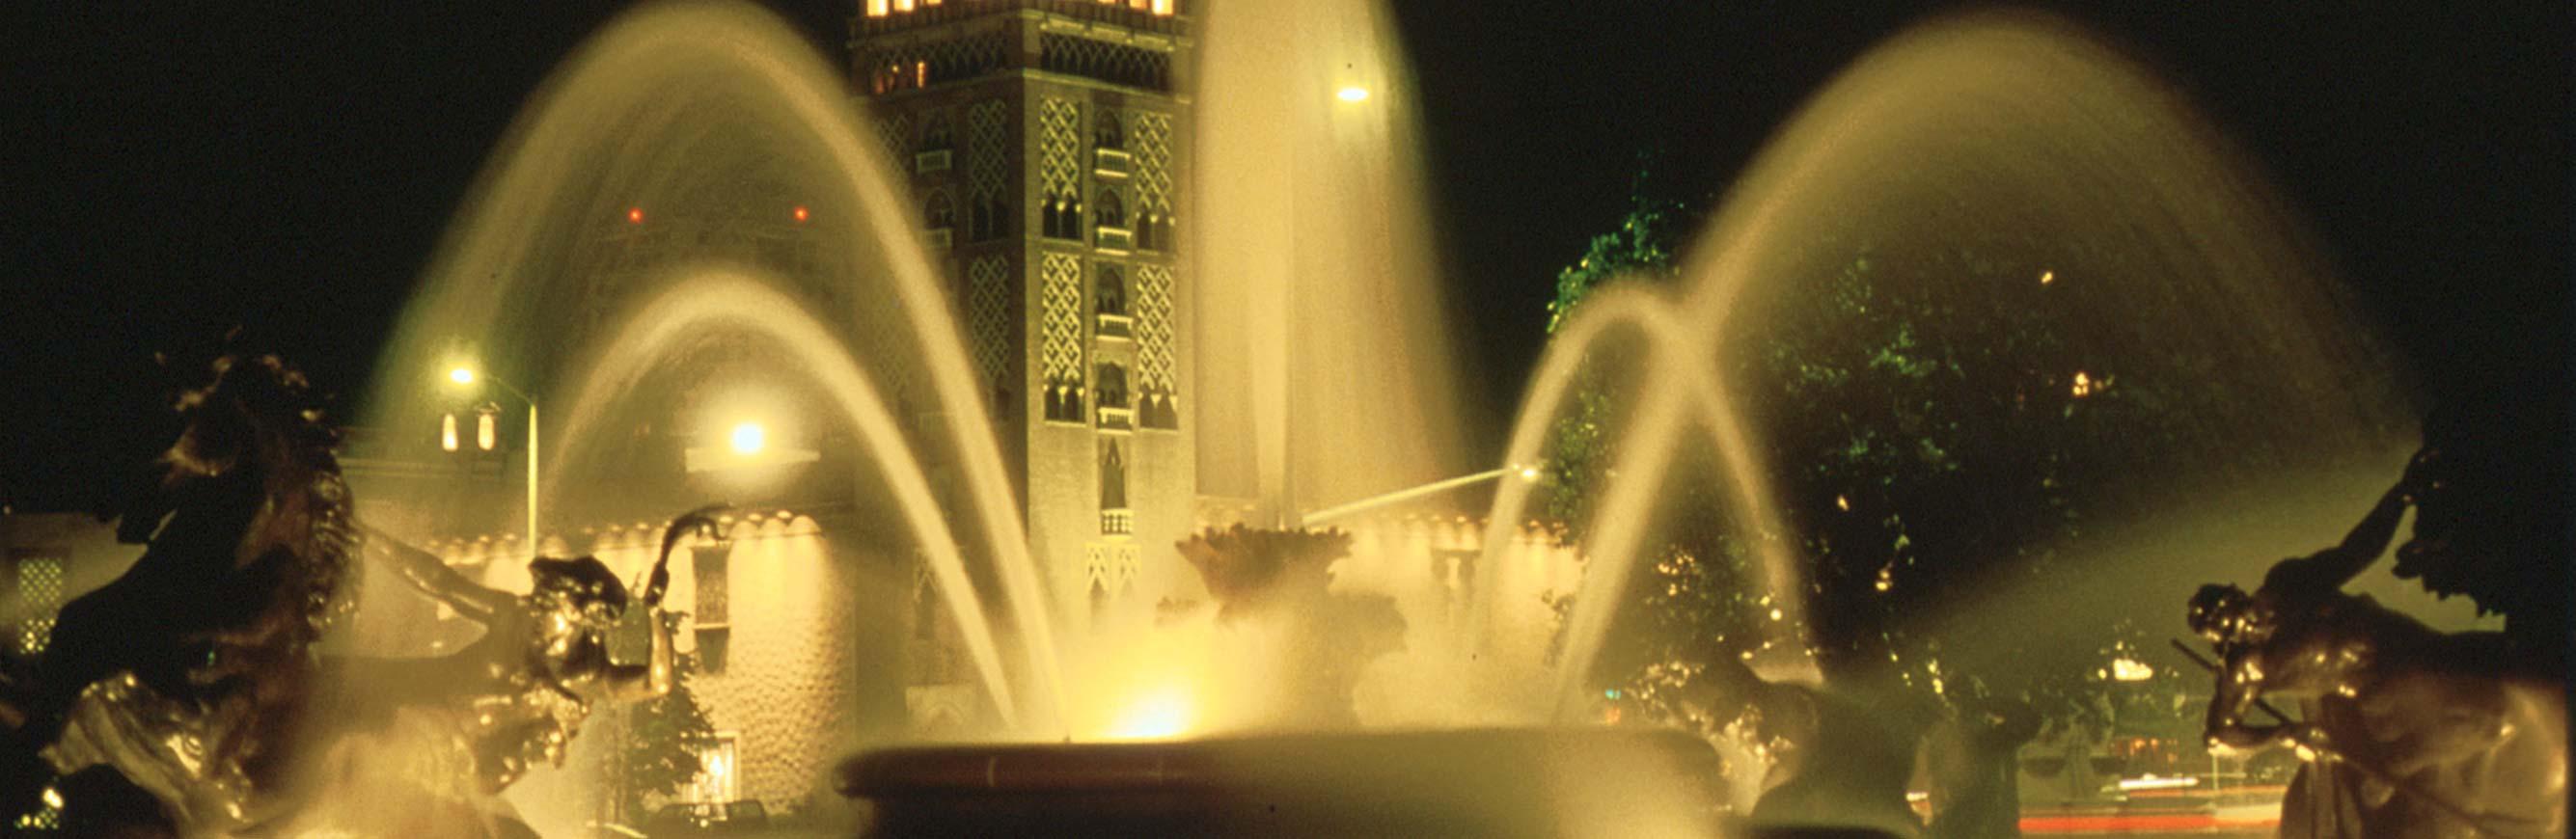 Kansas City - City of Fountains